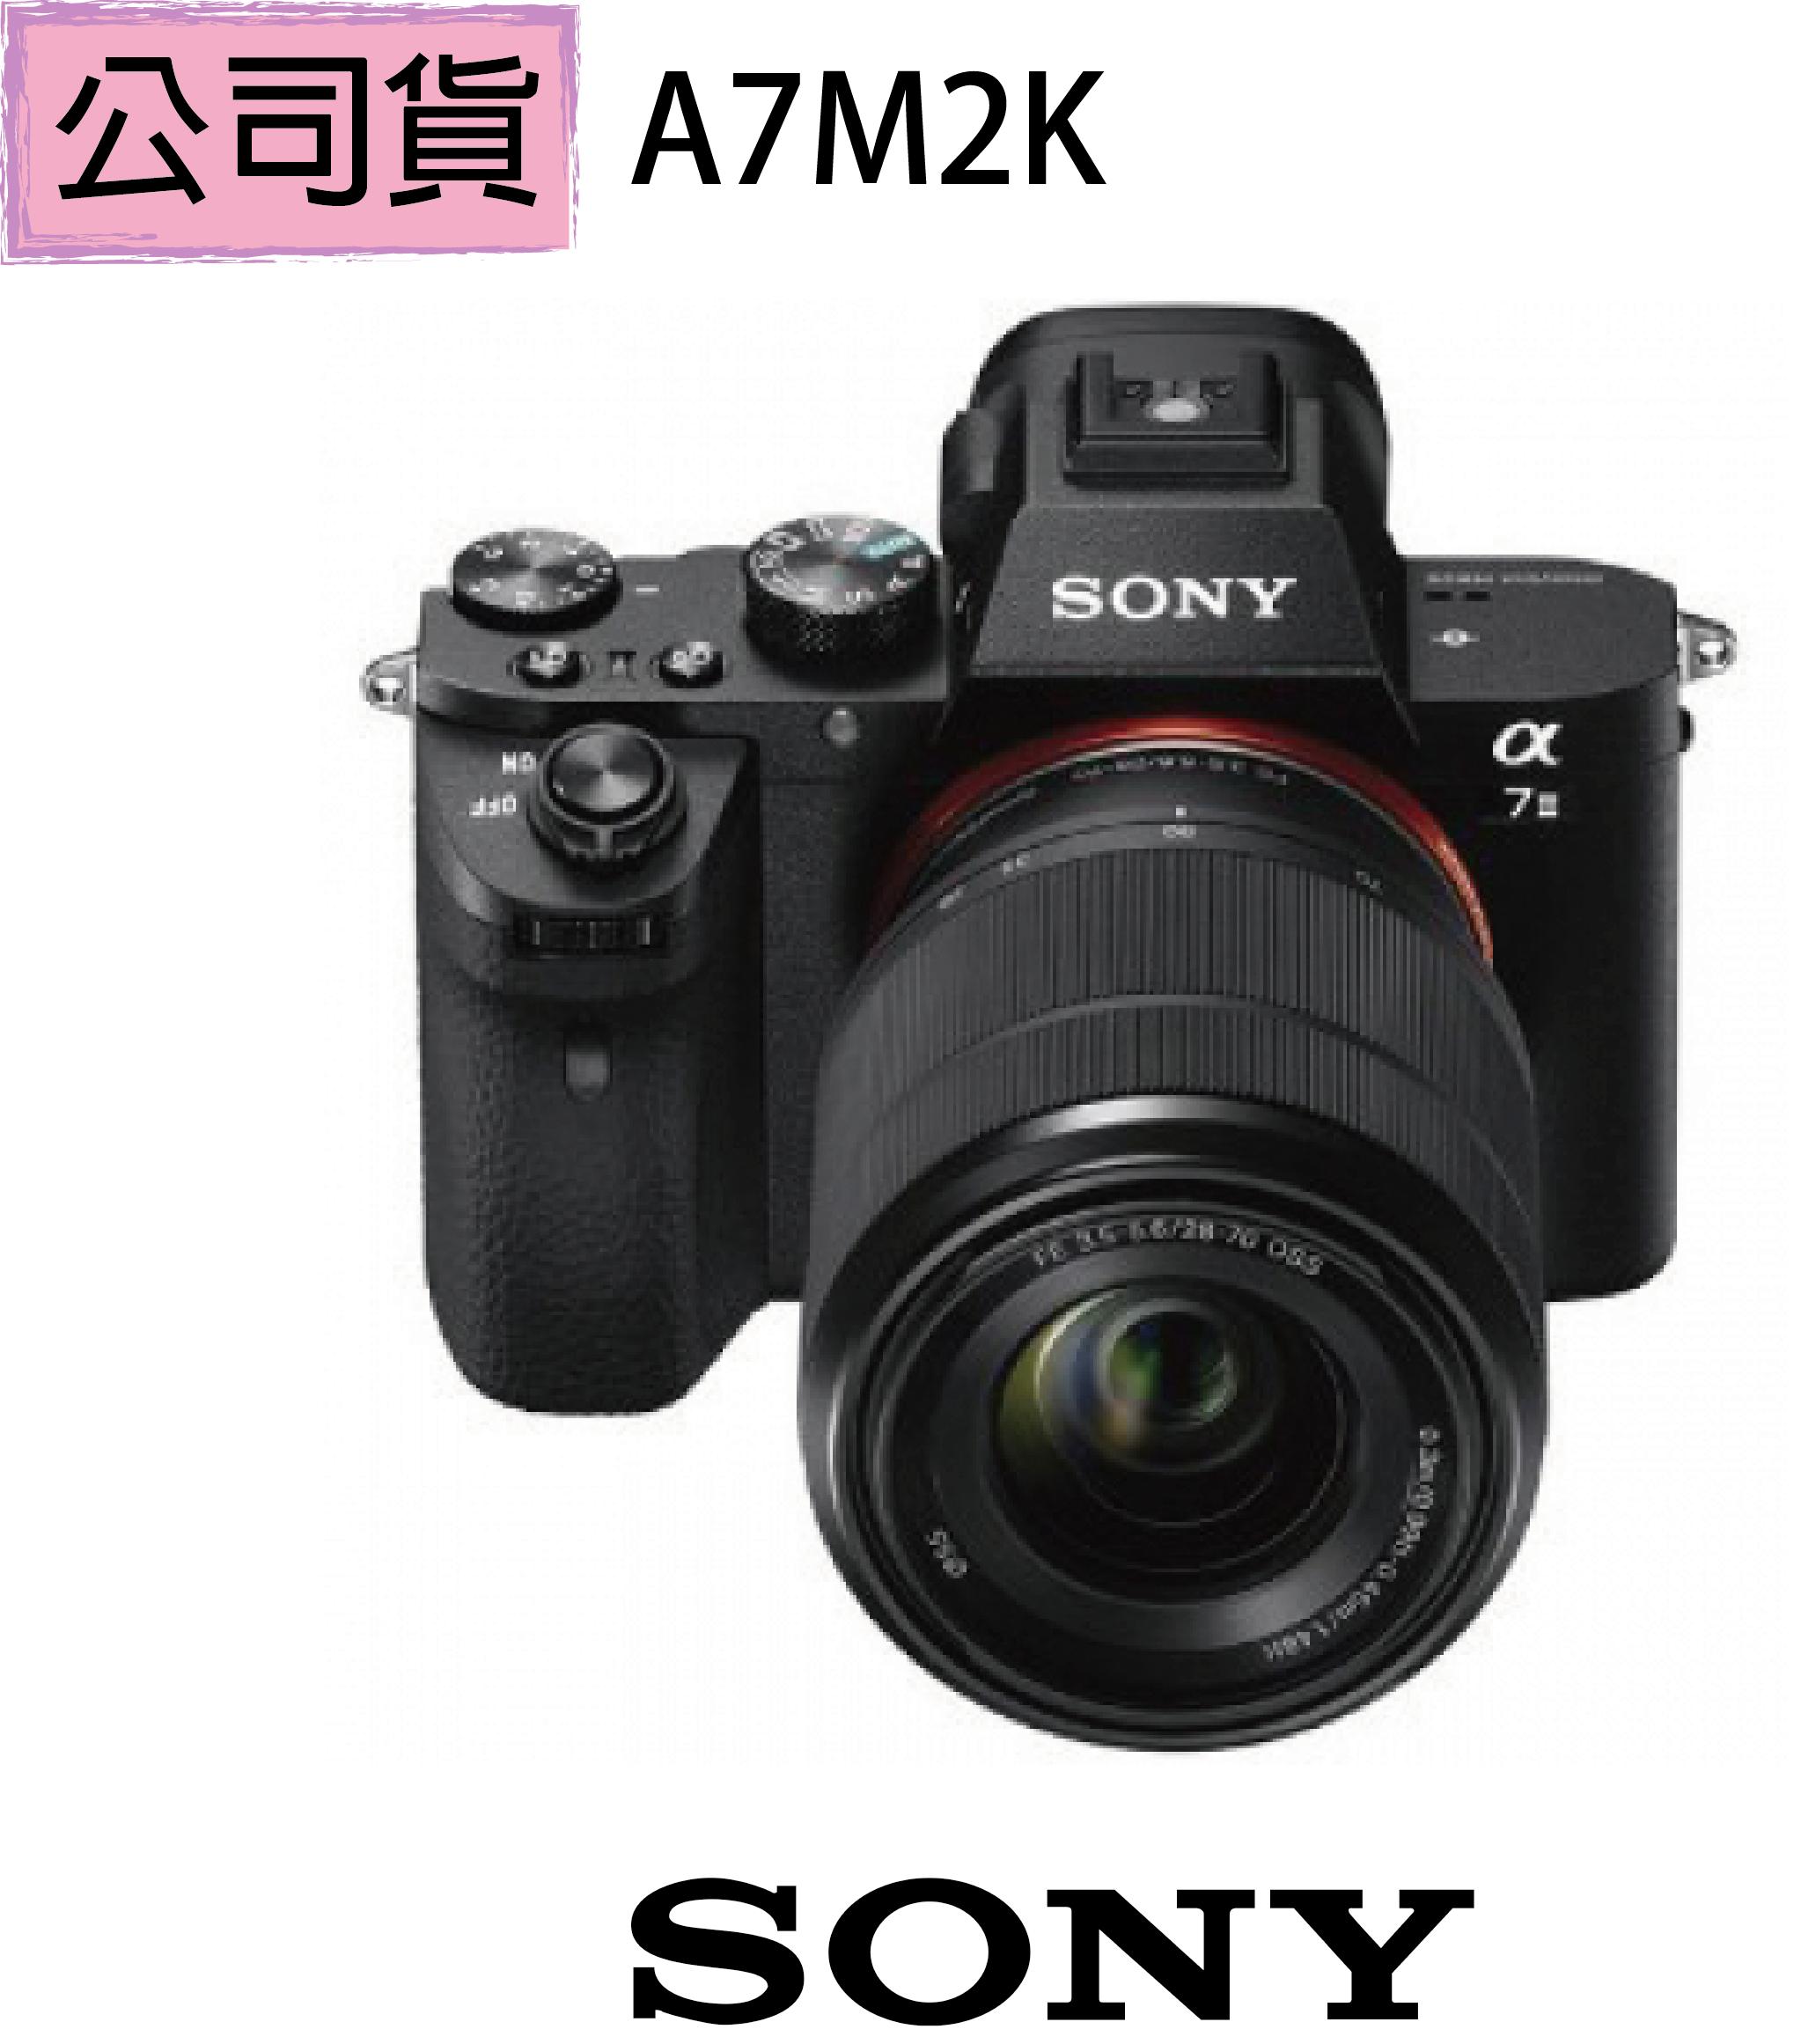 贈【SONY原廠高速64G記憶卡(SF-64UZ)市價2600】【SONY】ILCE-7M2K 變焦鏡組 A7M2K (公司貨)